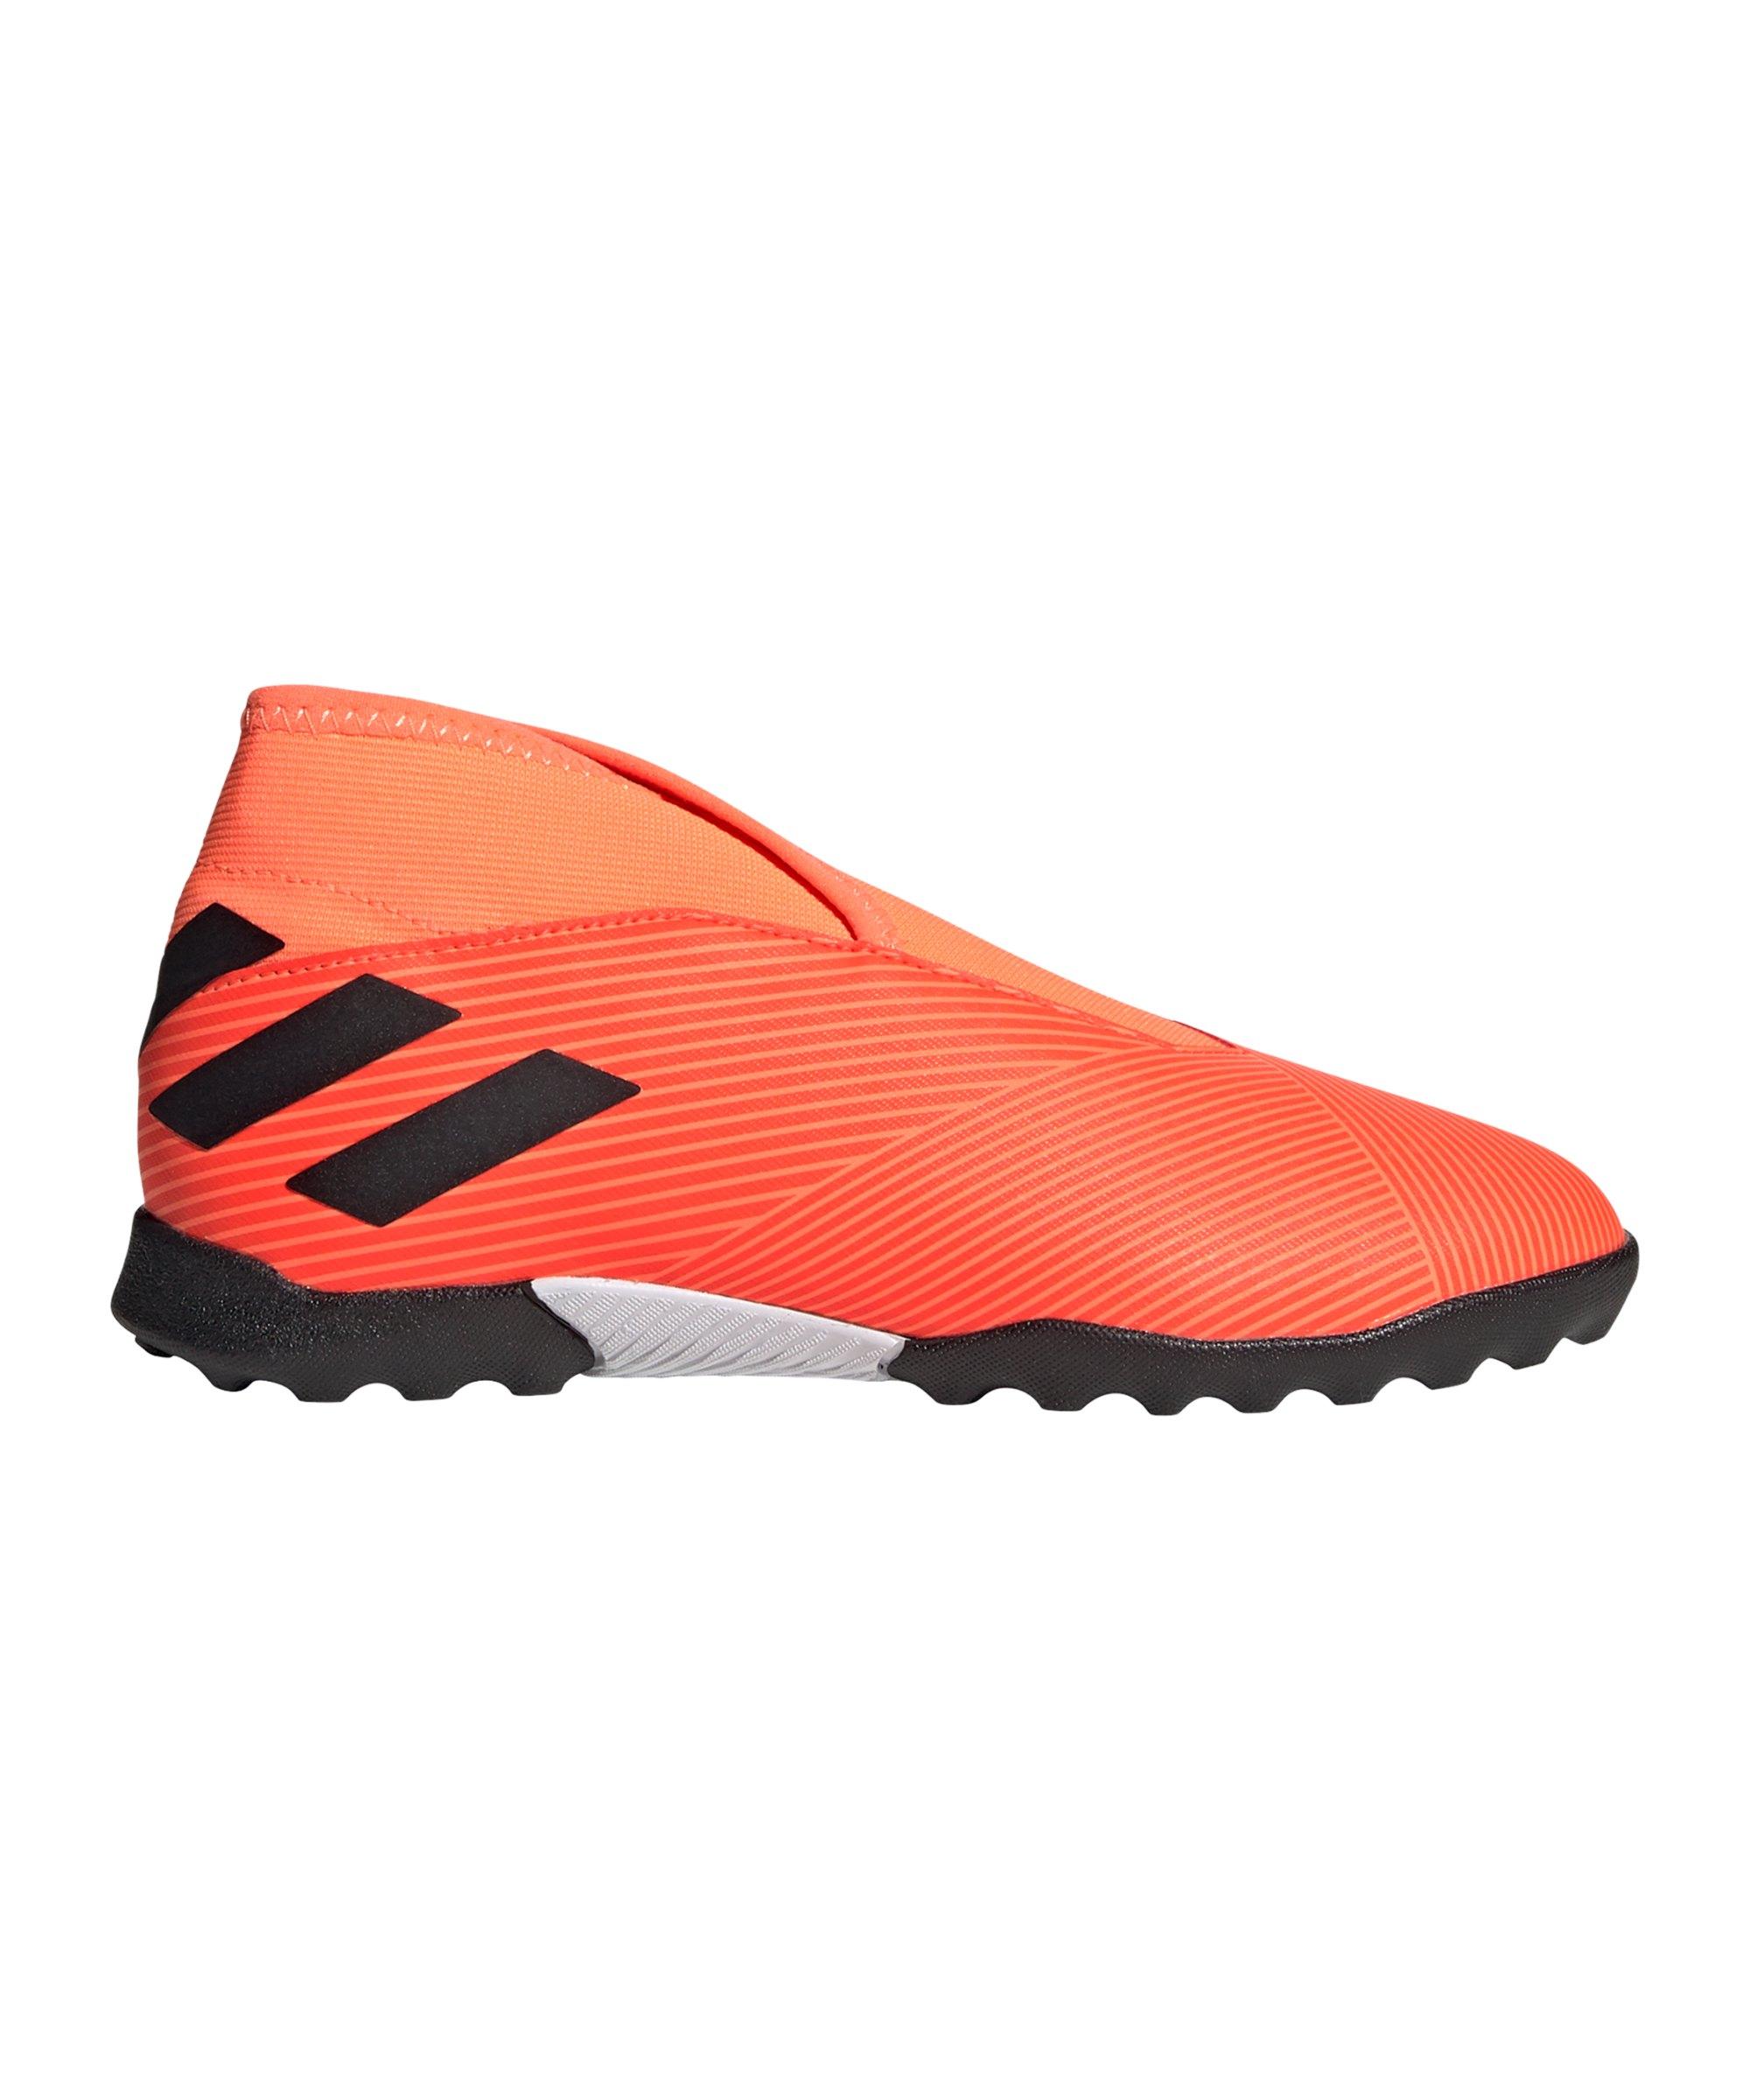 adidas NEMEZIZ Inflight 19.3 LL TF J Kids Orange - orange